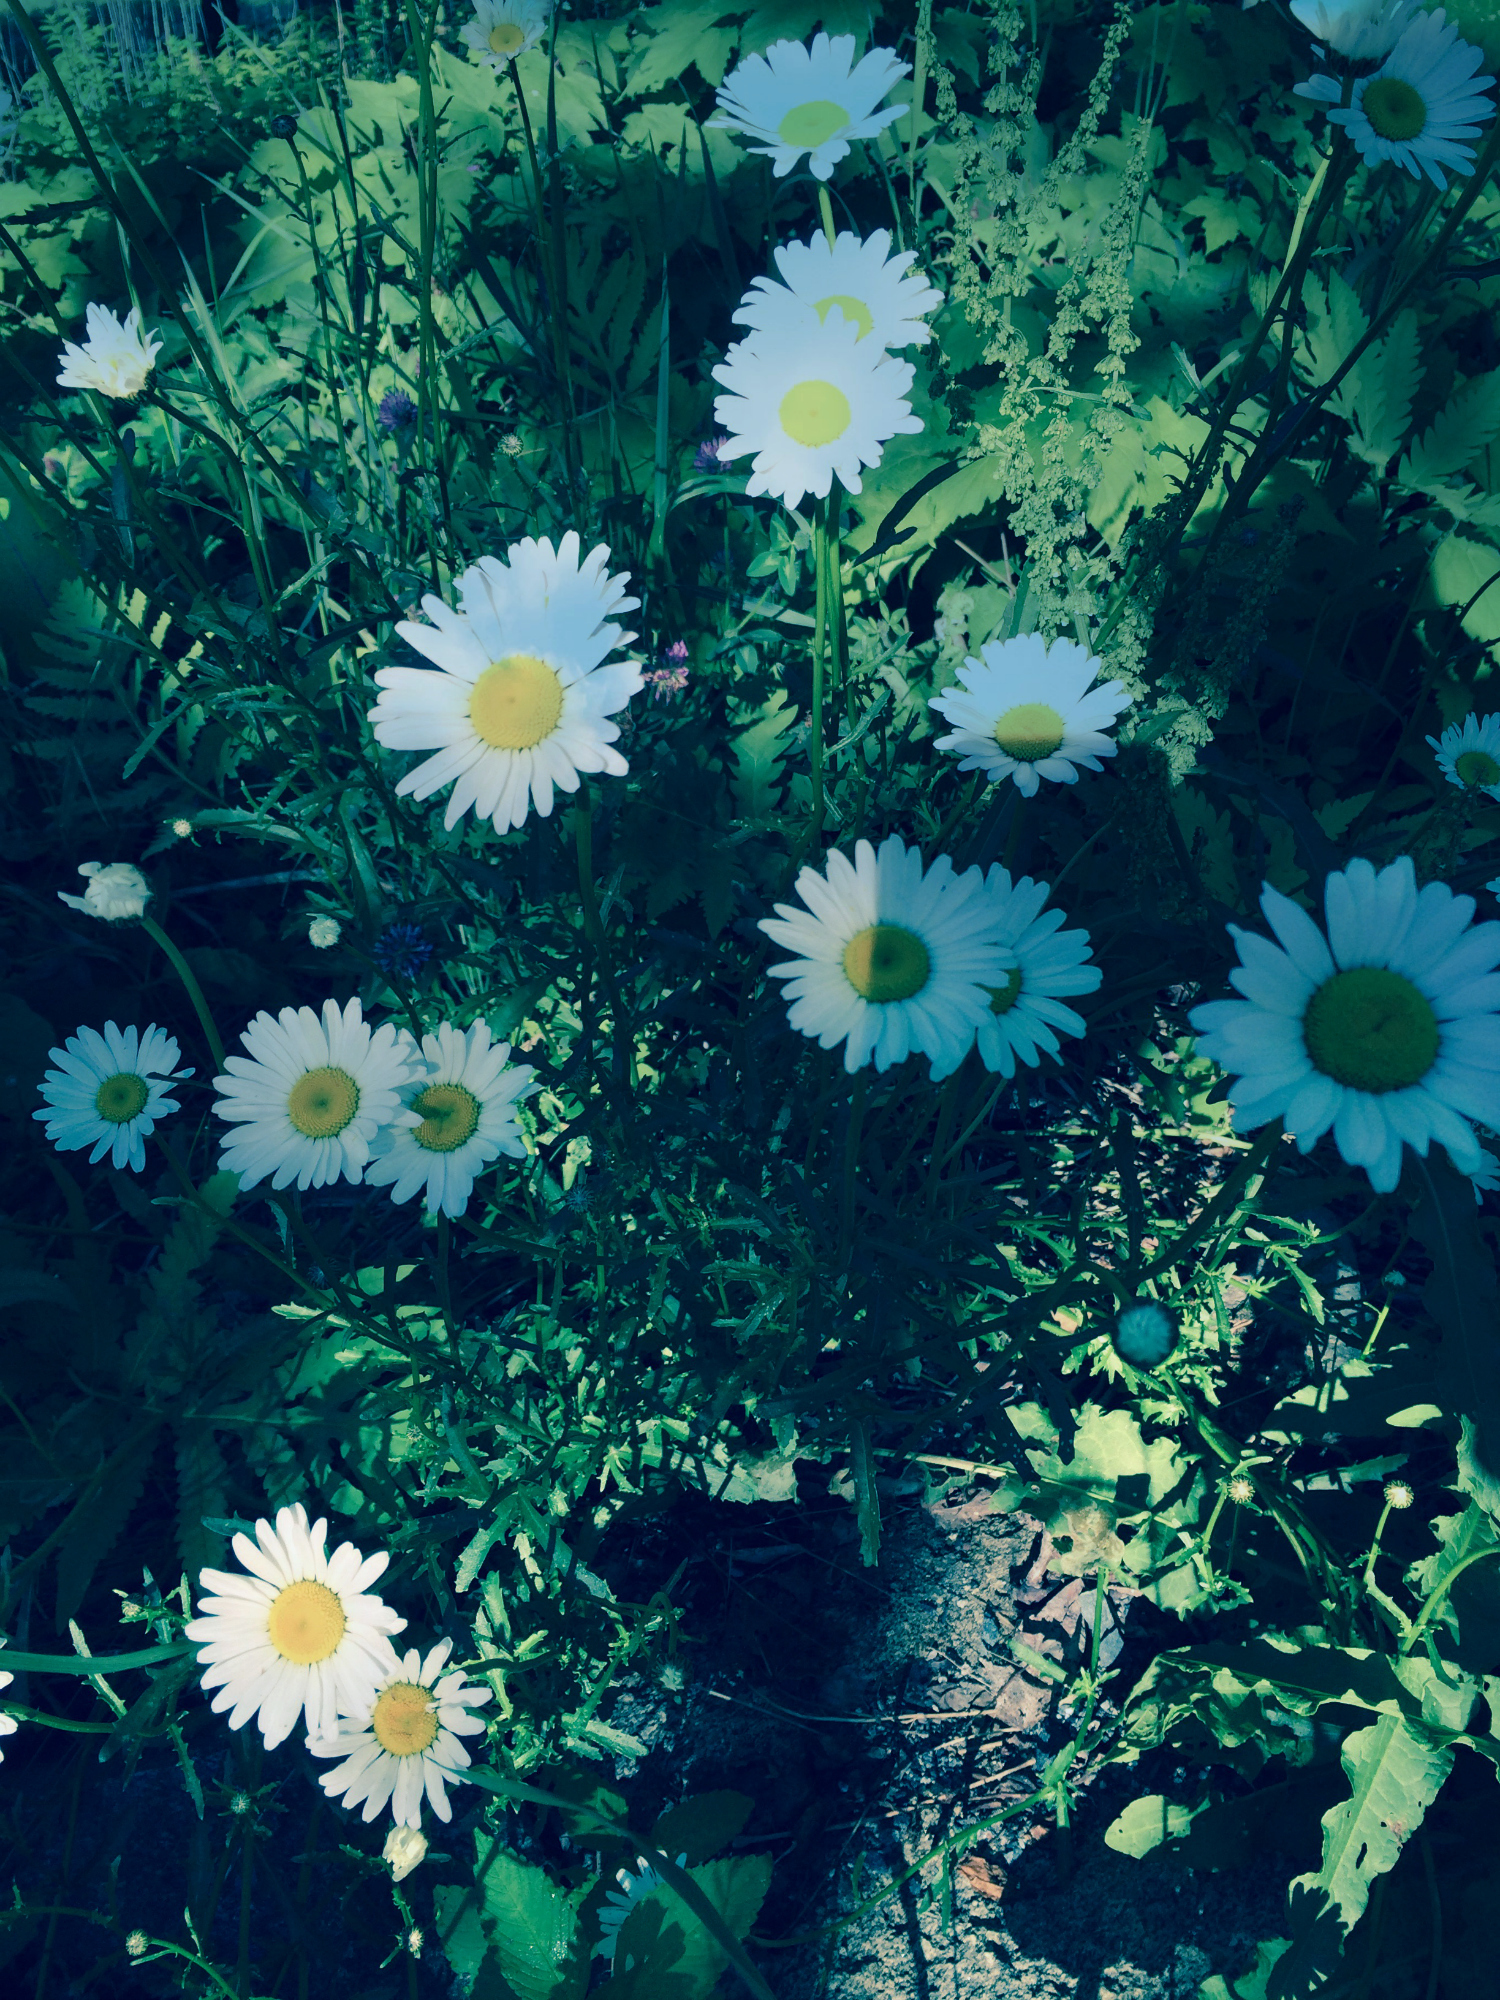 Wildflowers in Morning Light by Dena T Bray